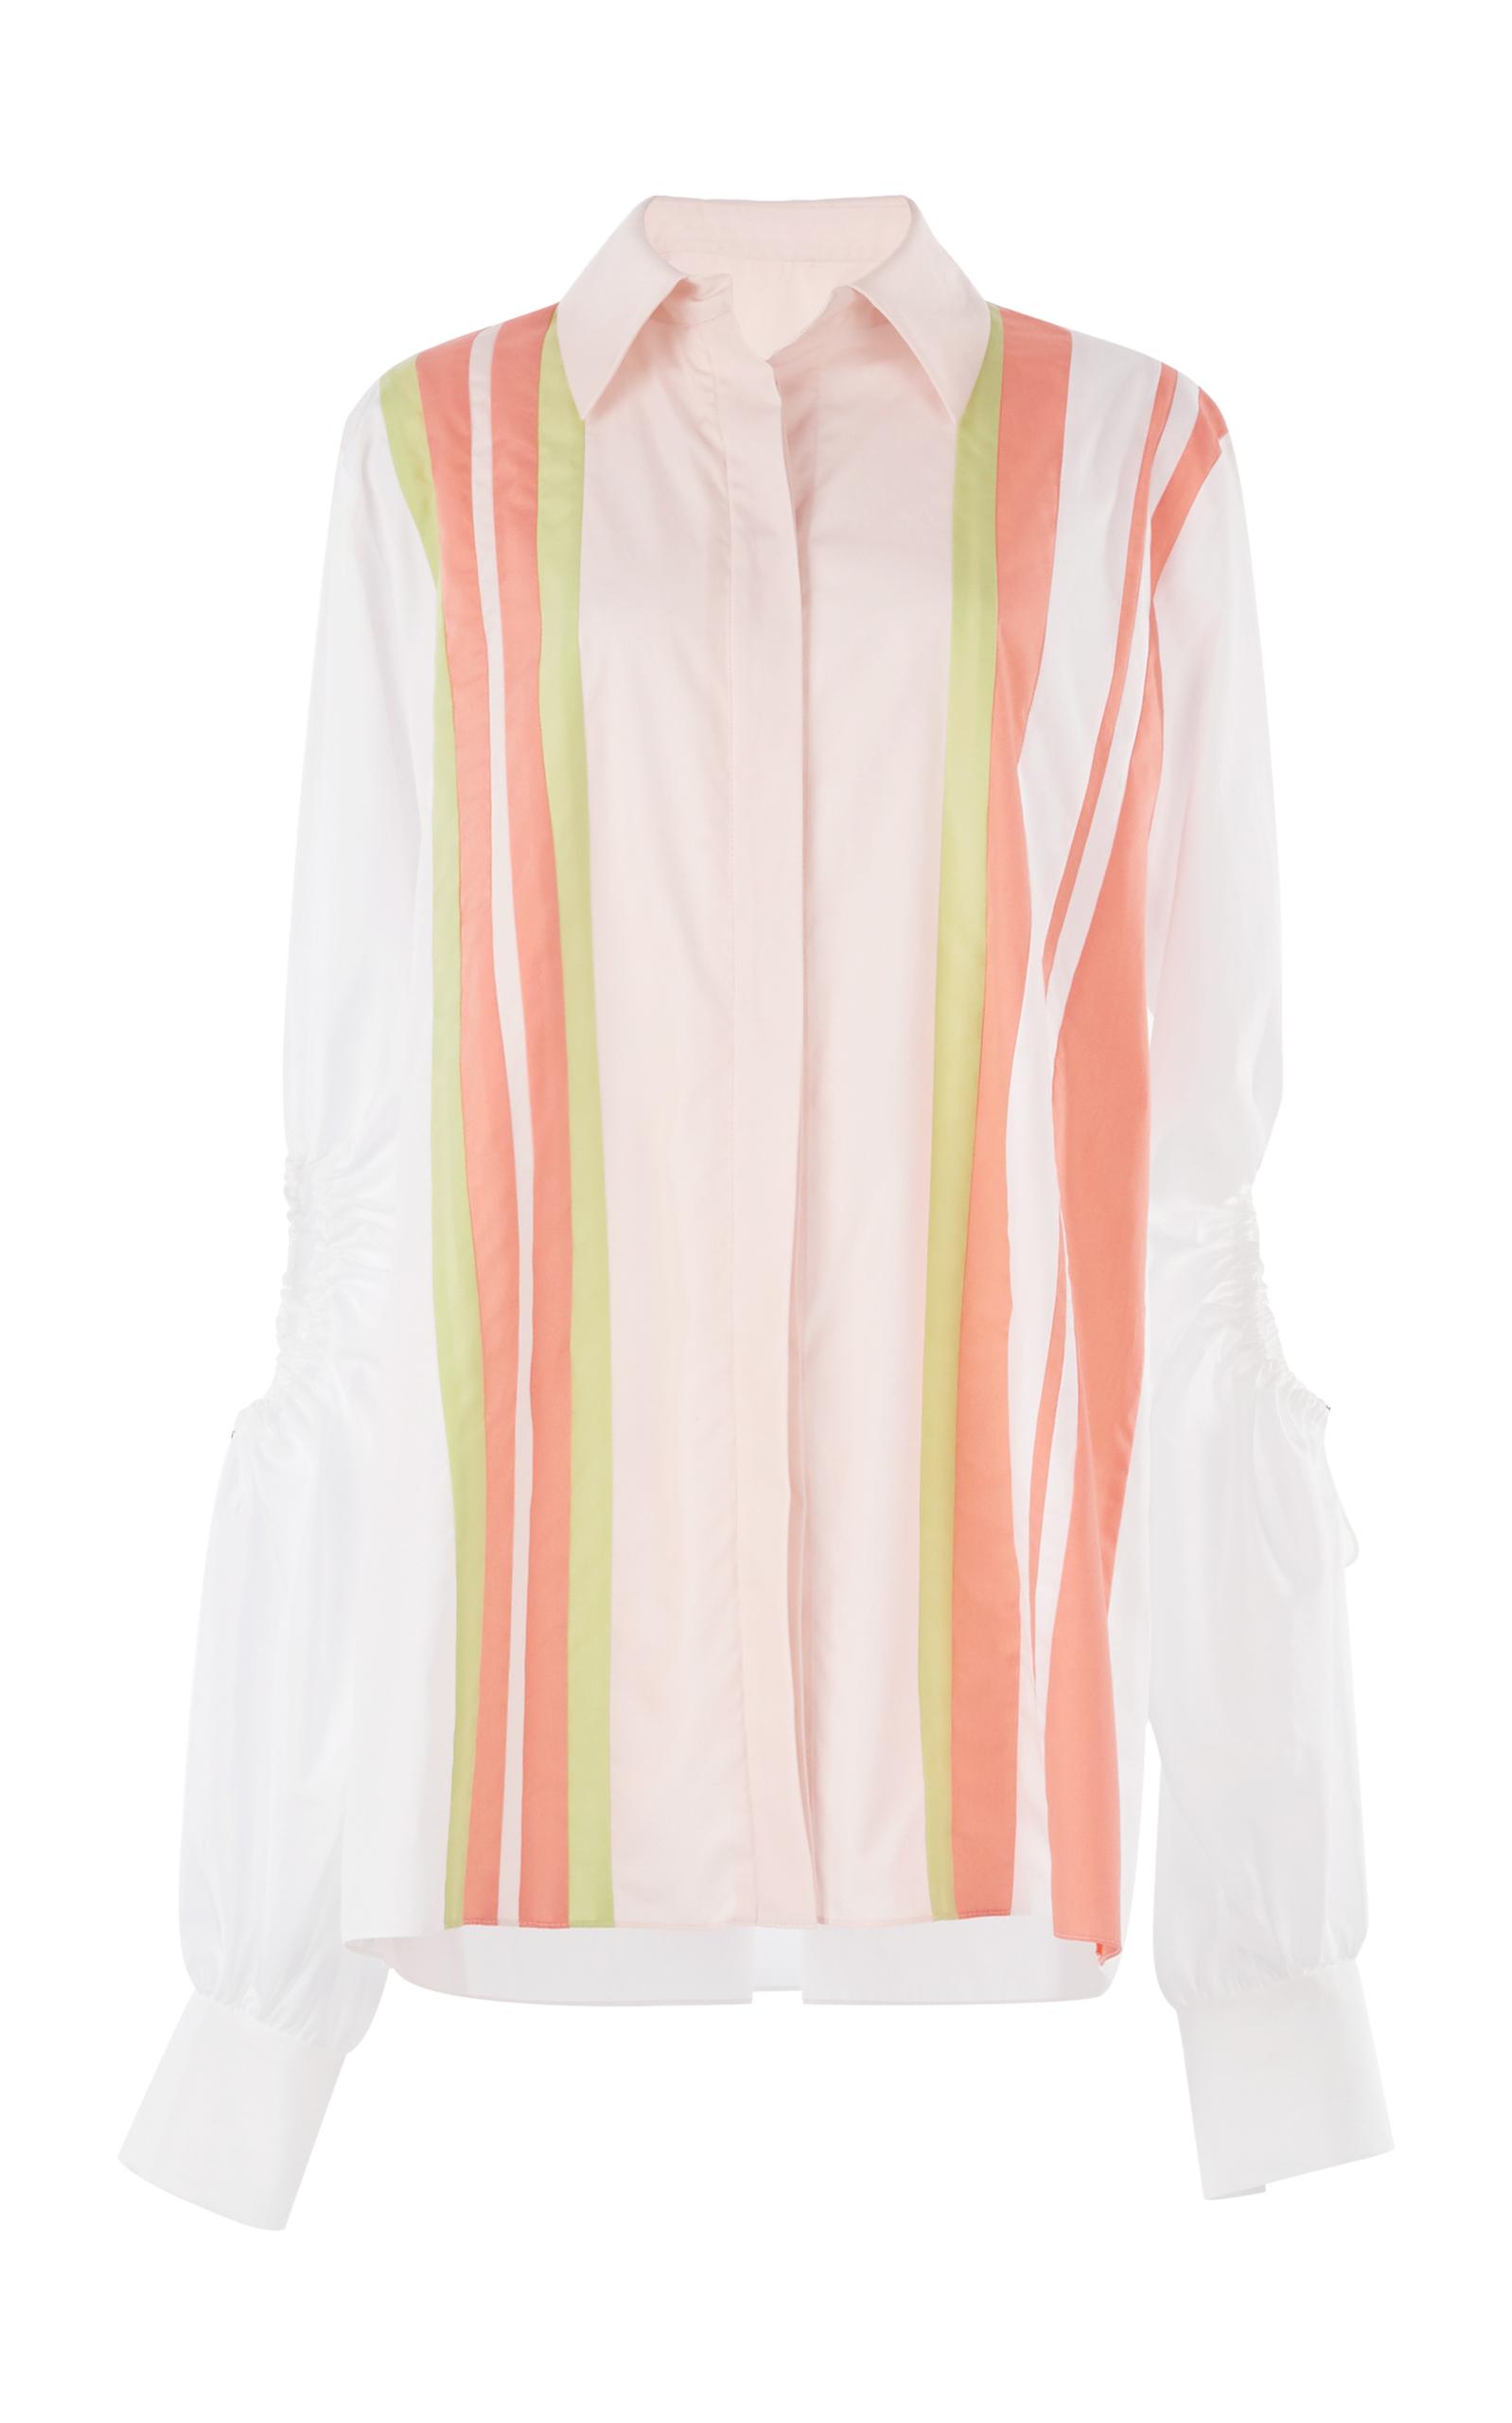 Peter Pilotto striped longline shirt Low Price Online 7rwcbOO